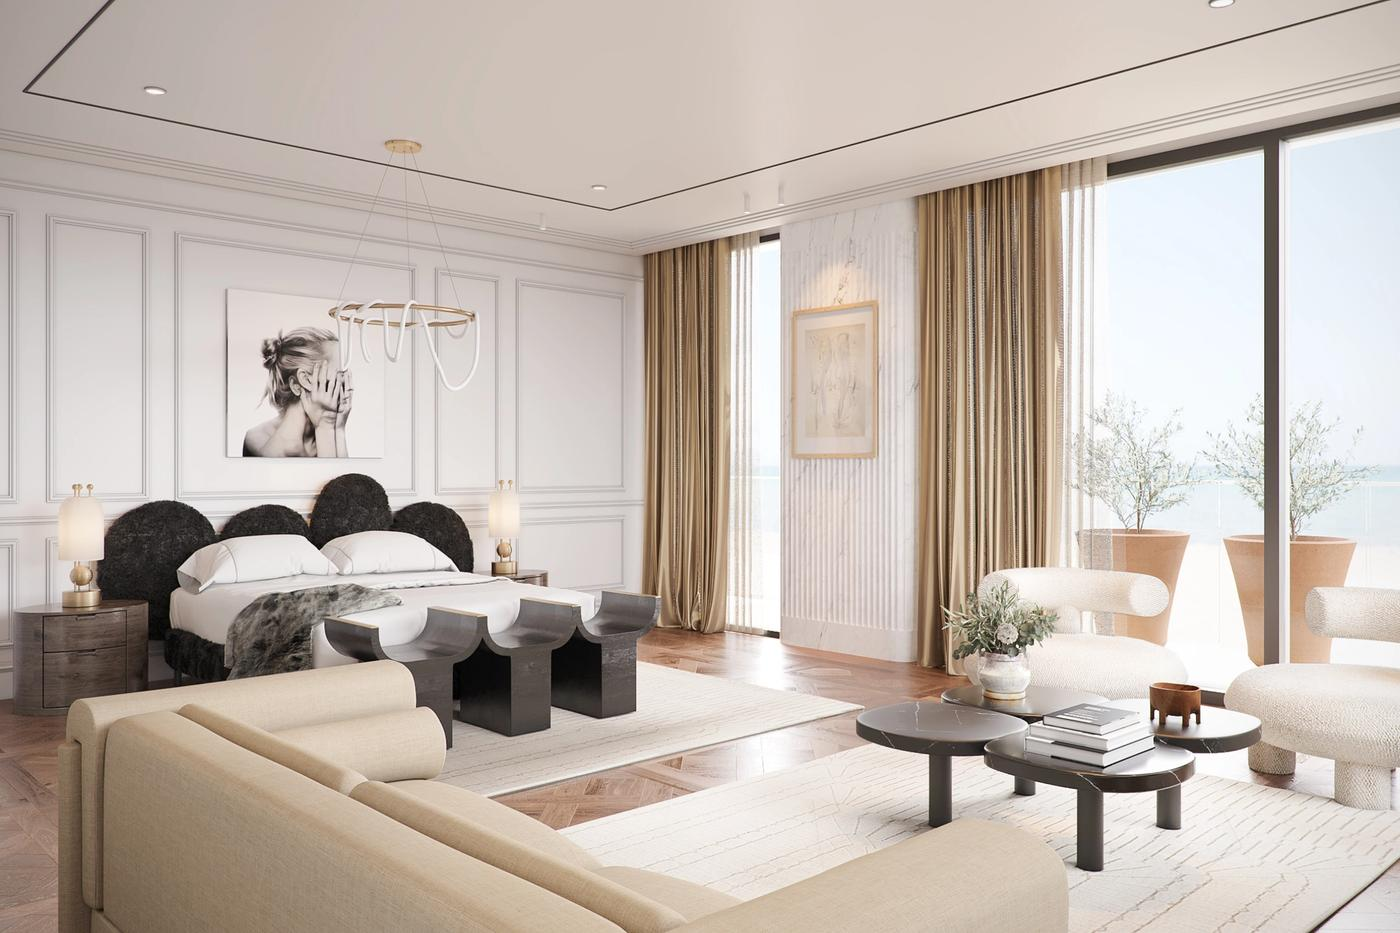 Beachside Villa Abu Dhabi